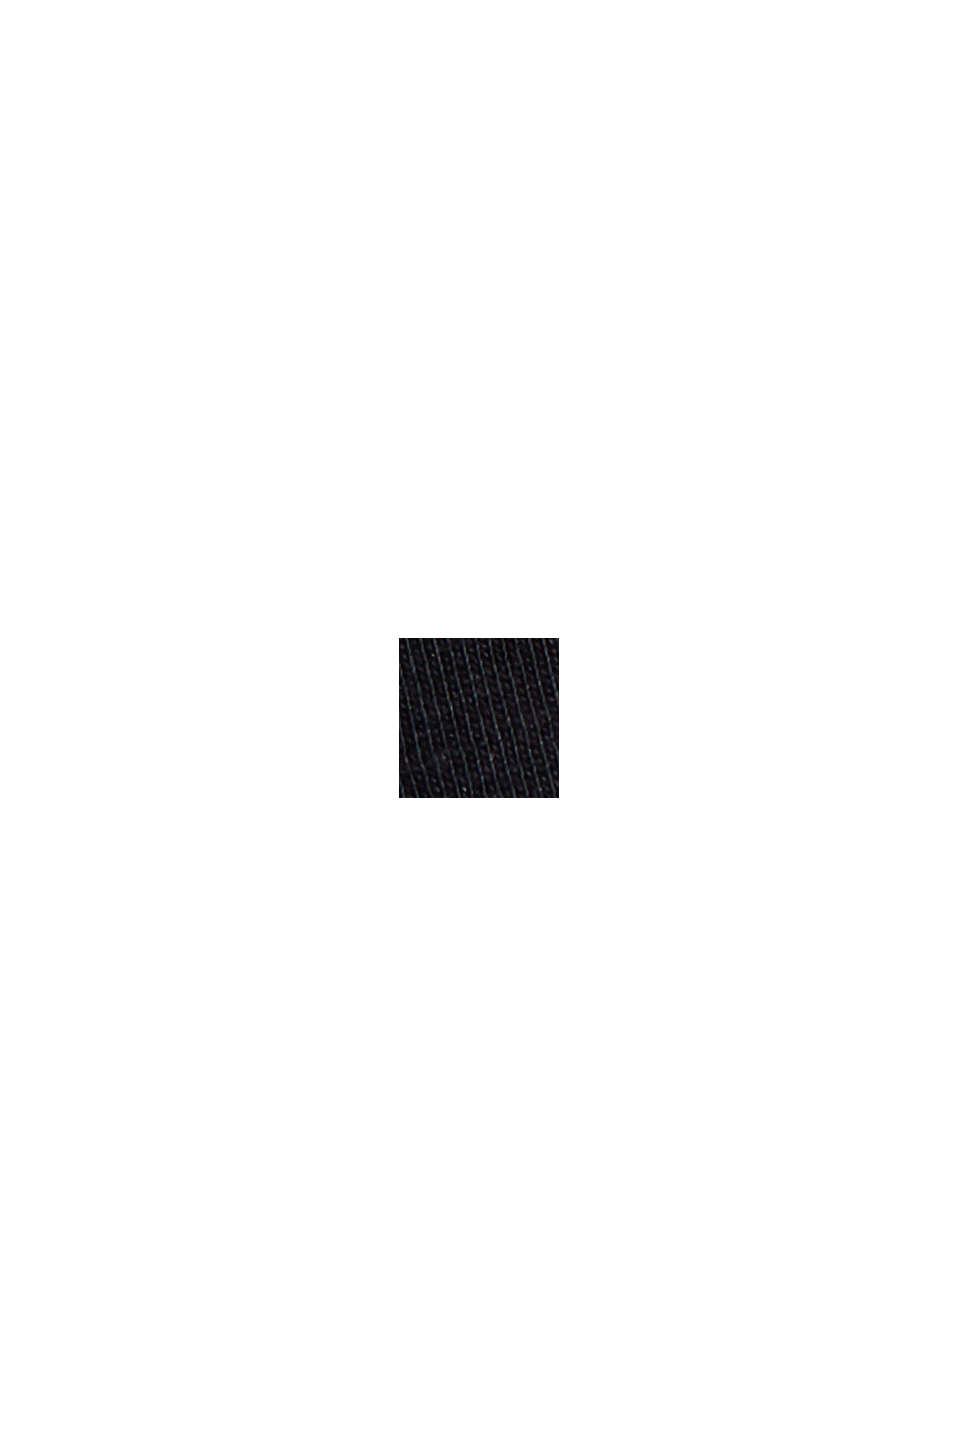 Met linnen/biologisch katoen: jersey poloshirt, BLACK, swatch